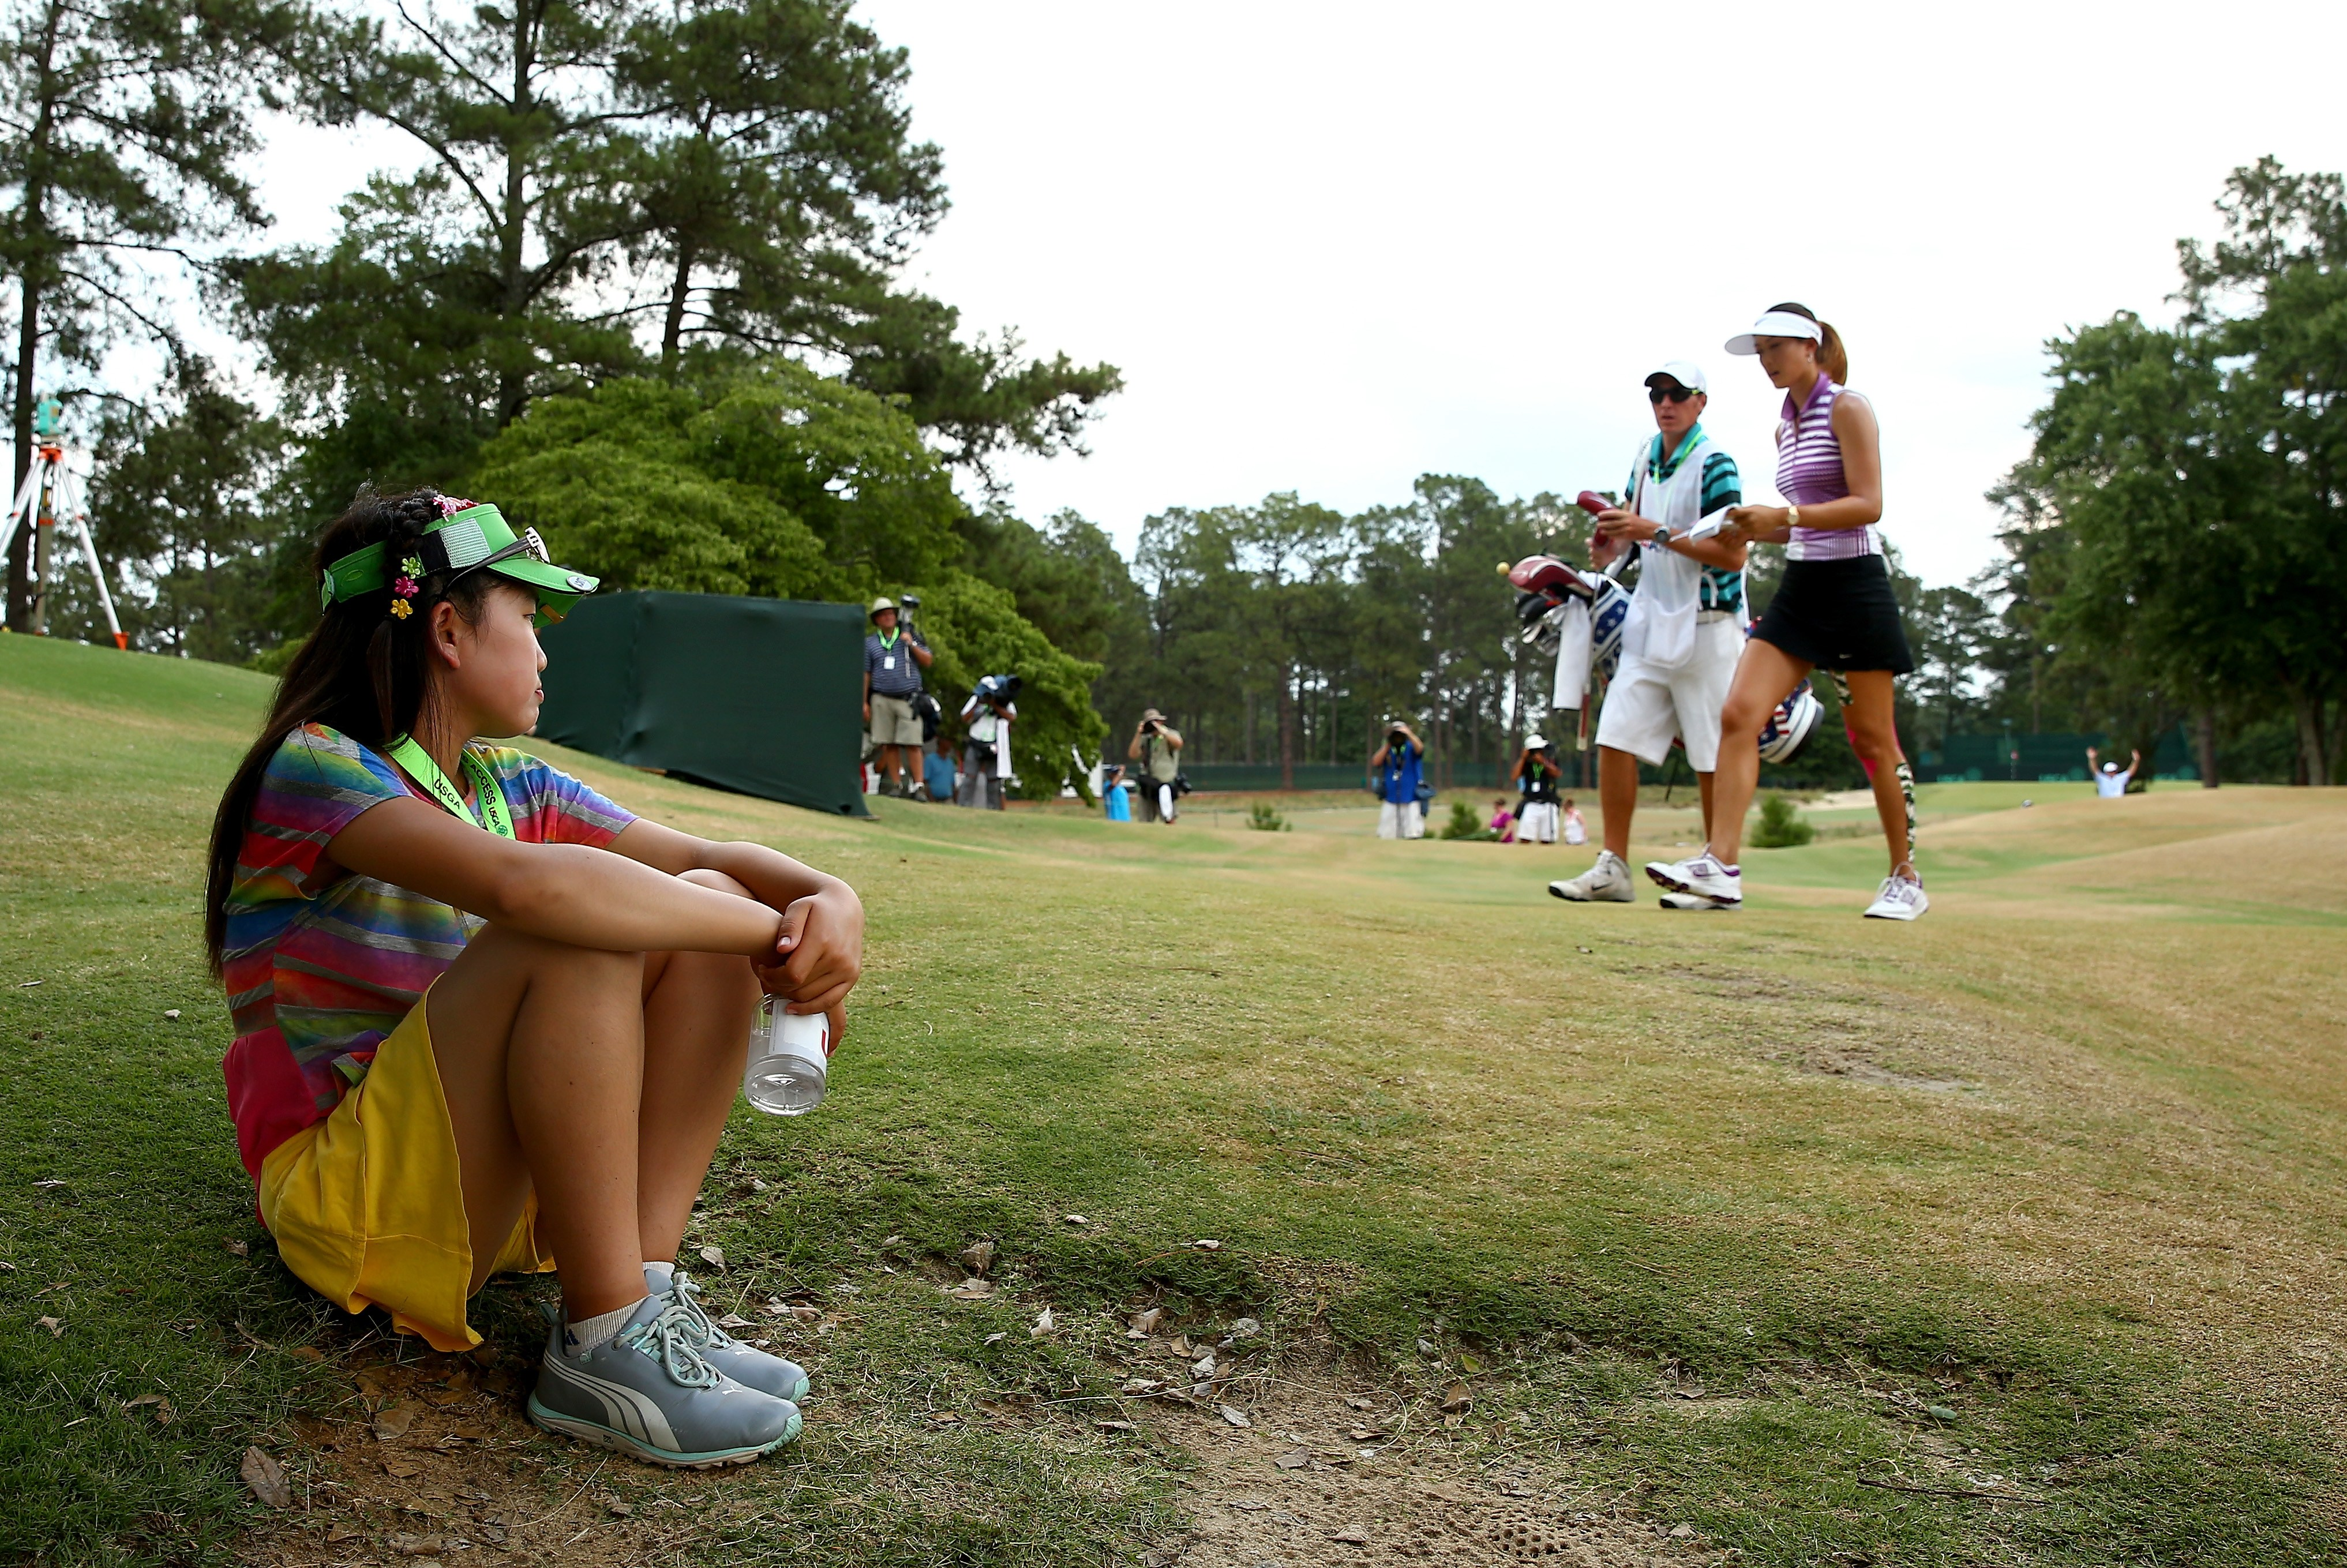 Lucy Li and Michelle Wie